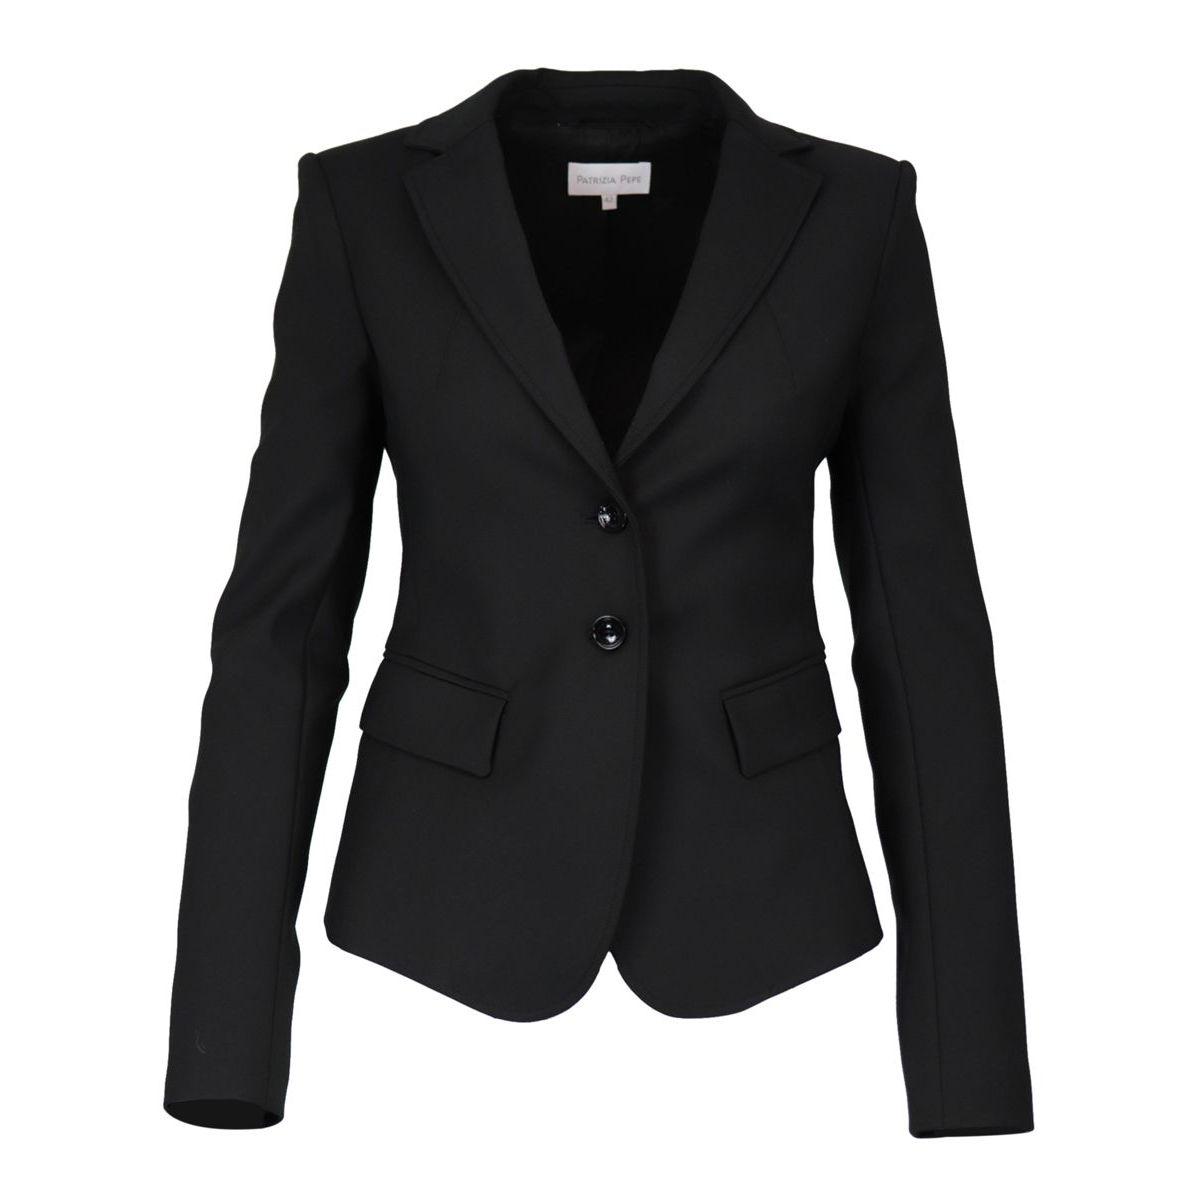 Single-breasted two-button cotton blend jacket Black Patrizia Pepe